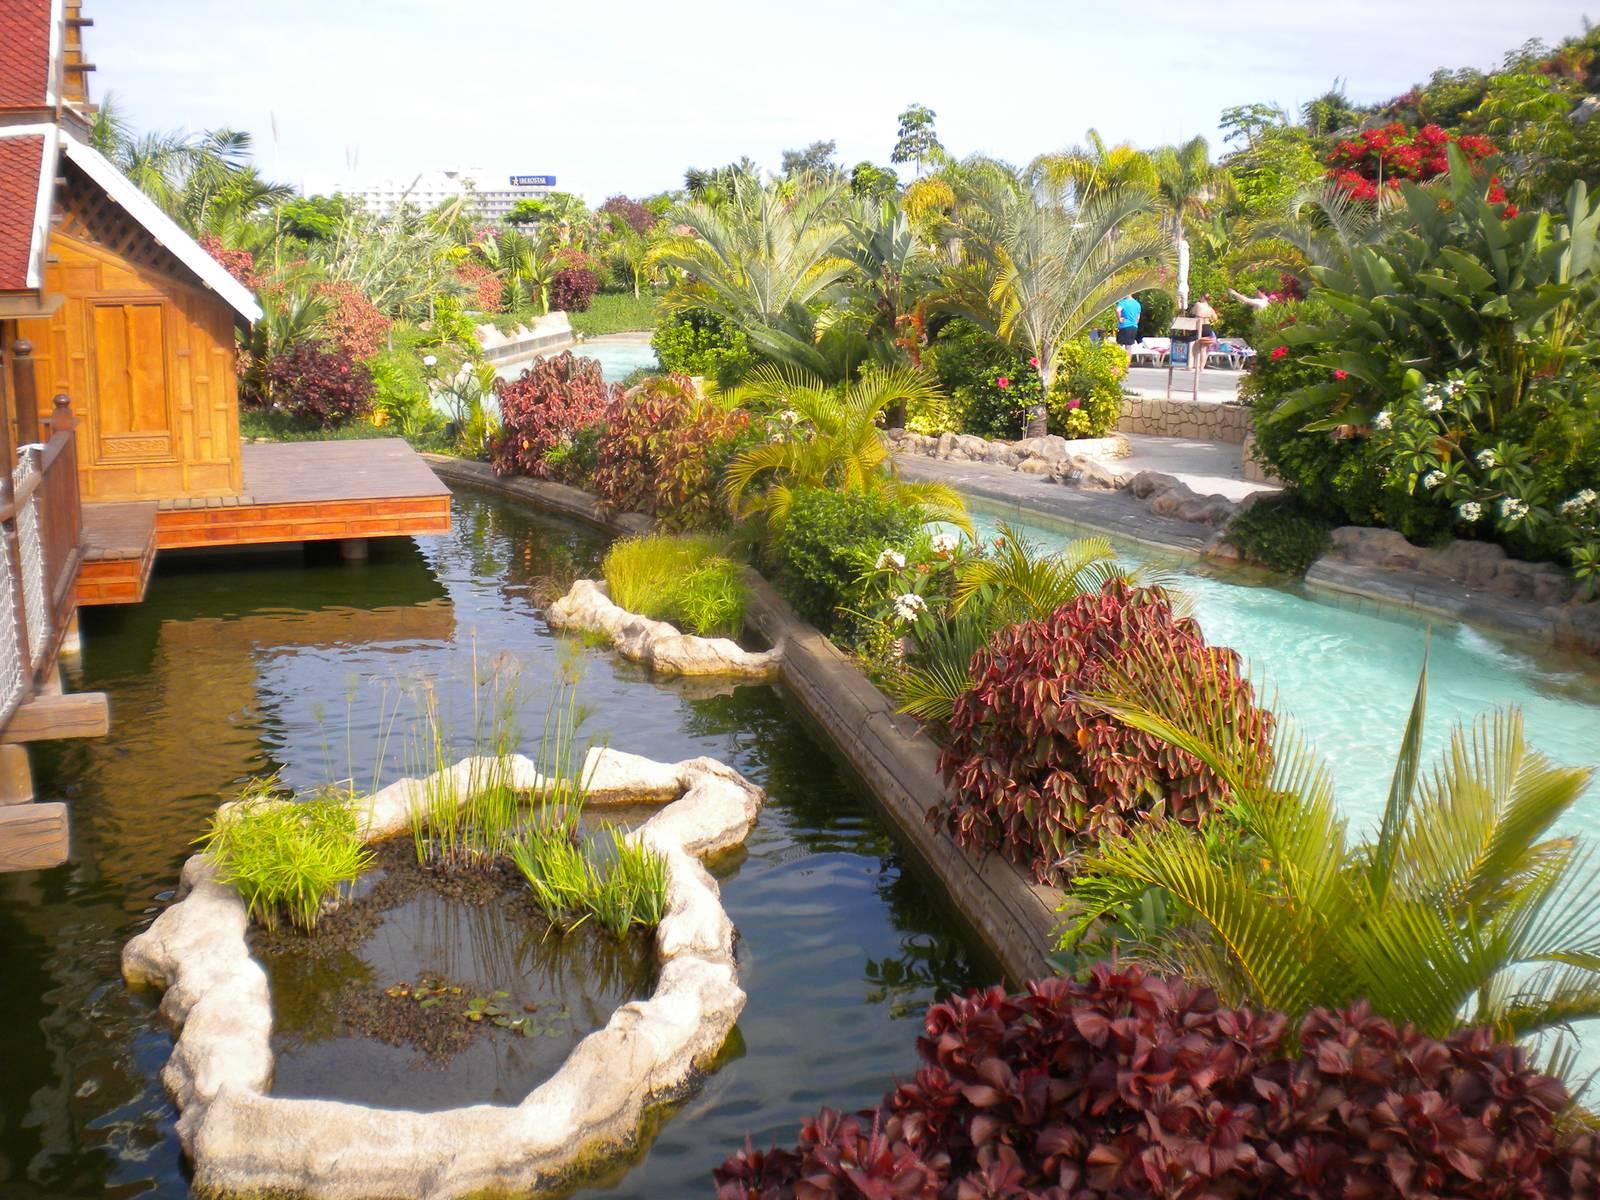 siam park16 Siam Park More Than a Water Park